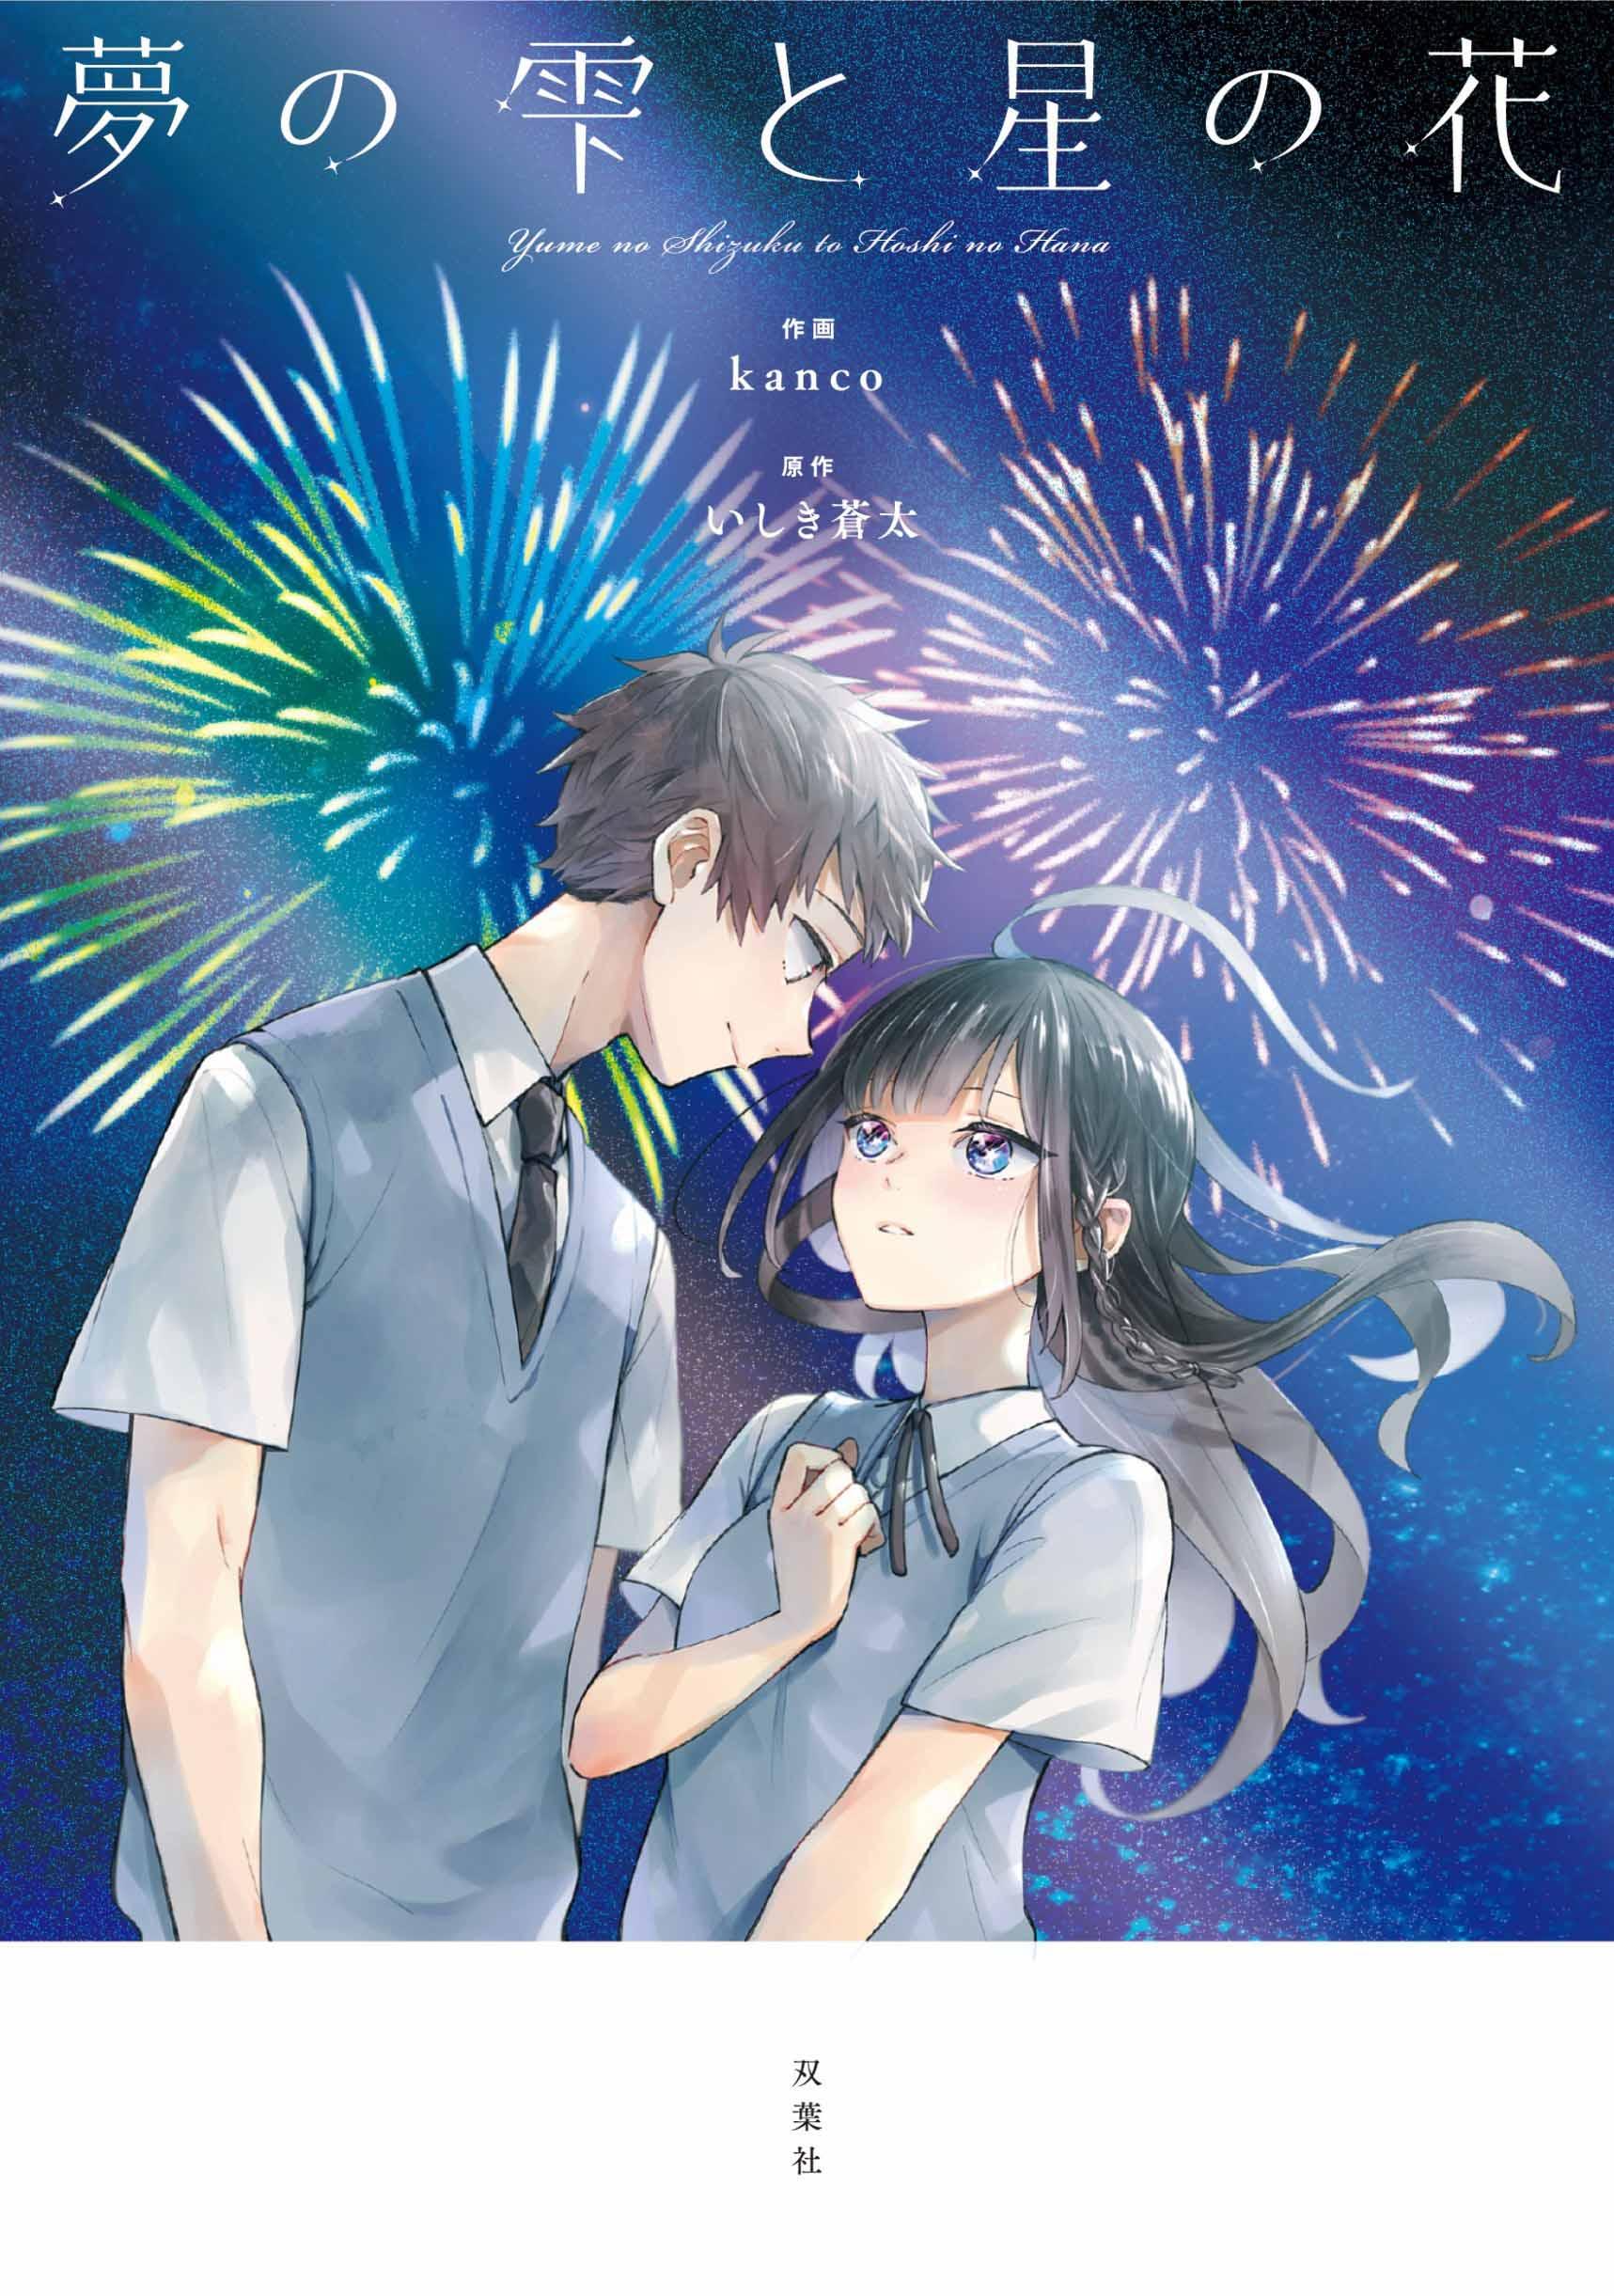 YOASOBIの楽曲コミカライズ「夢の雫と星の花」バレンタインに発売!新たな書き下ろし小説などが収録された超豪華版